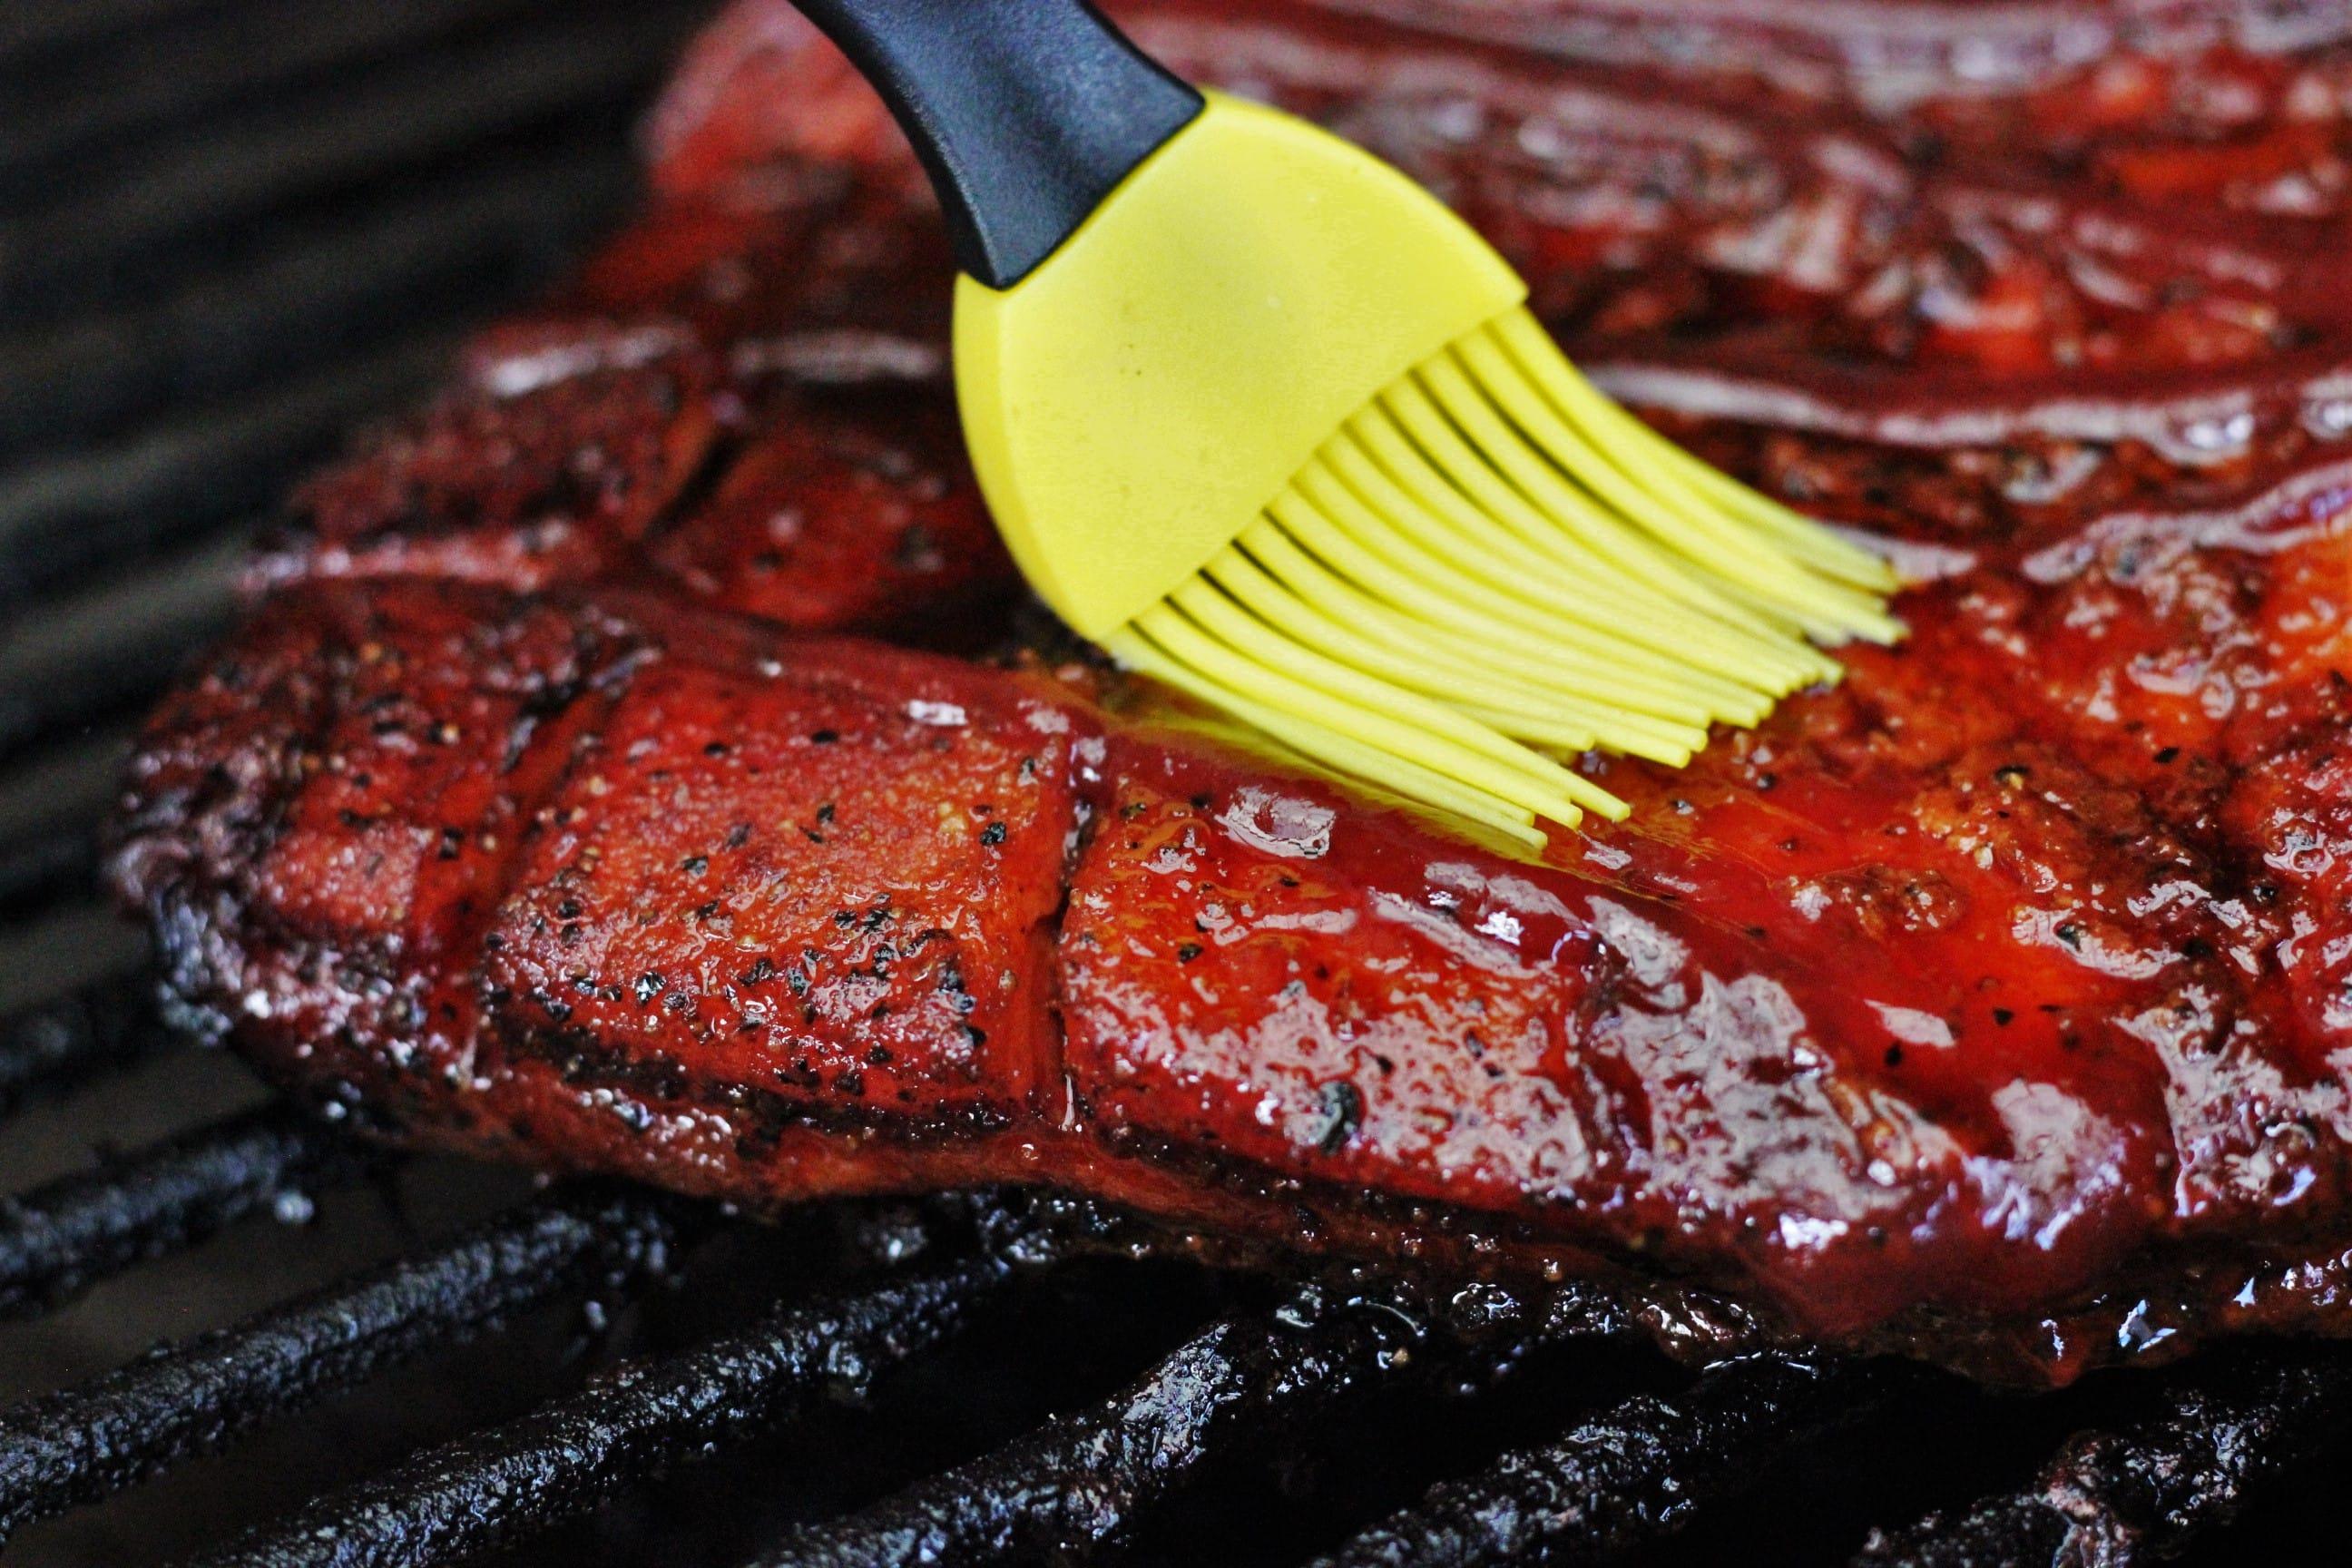 basting brush brushing BBQ sauce on smoked pork belly